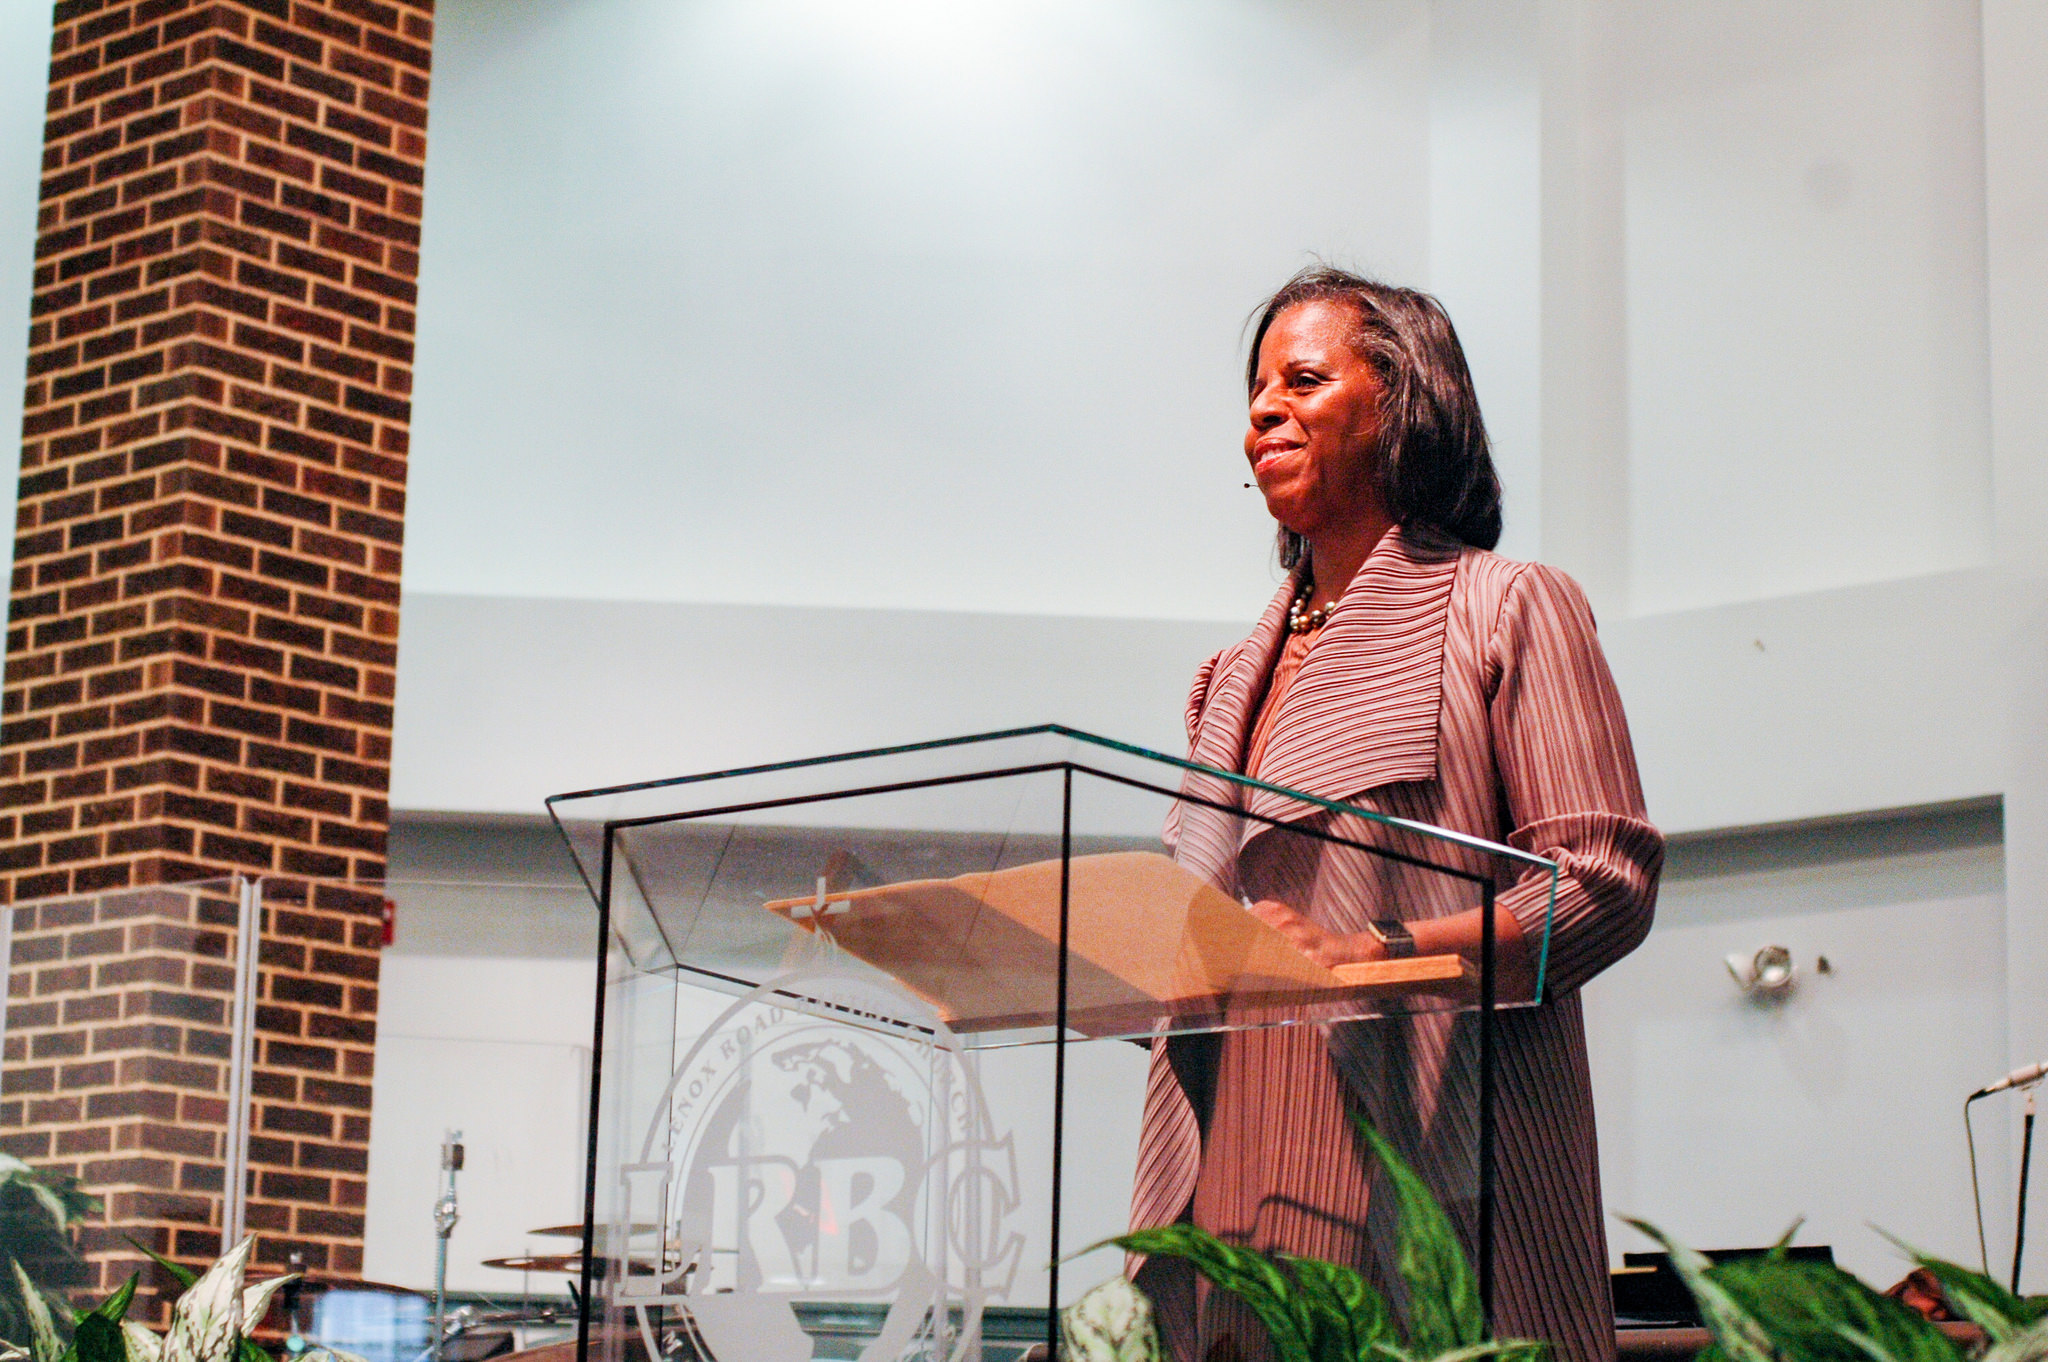 The Rev. Dr. Cheryl F. Dudley